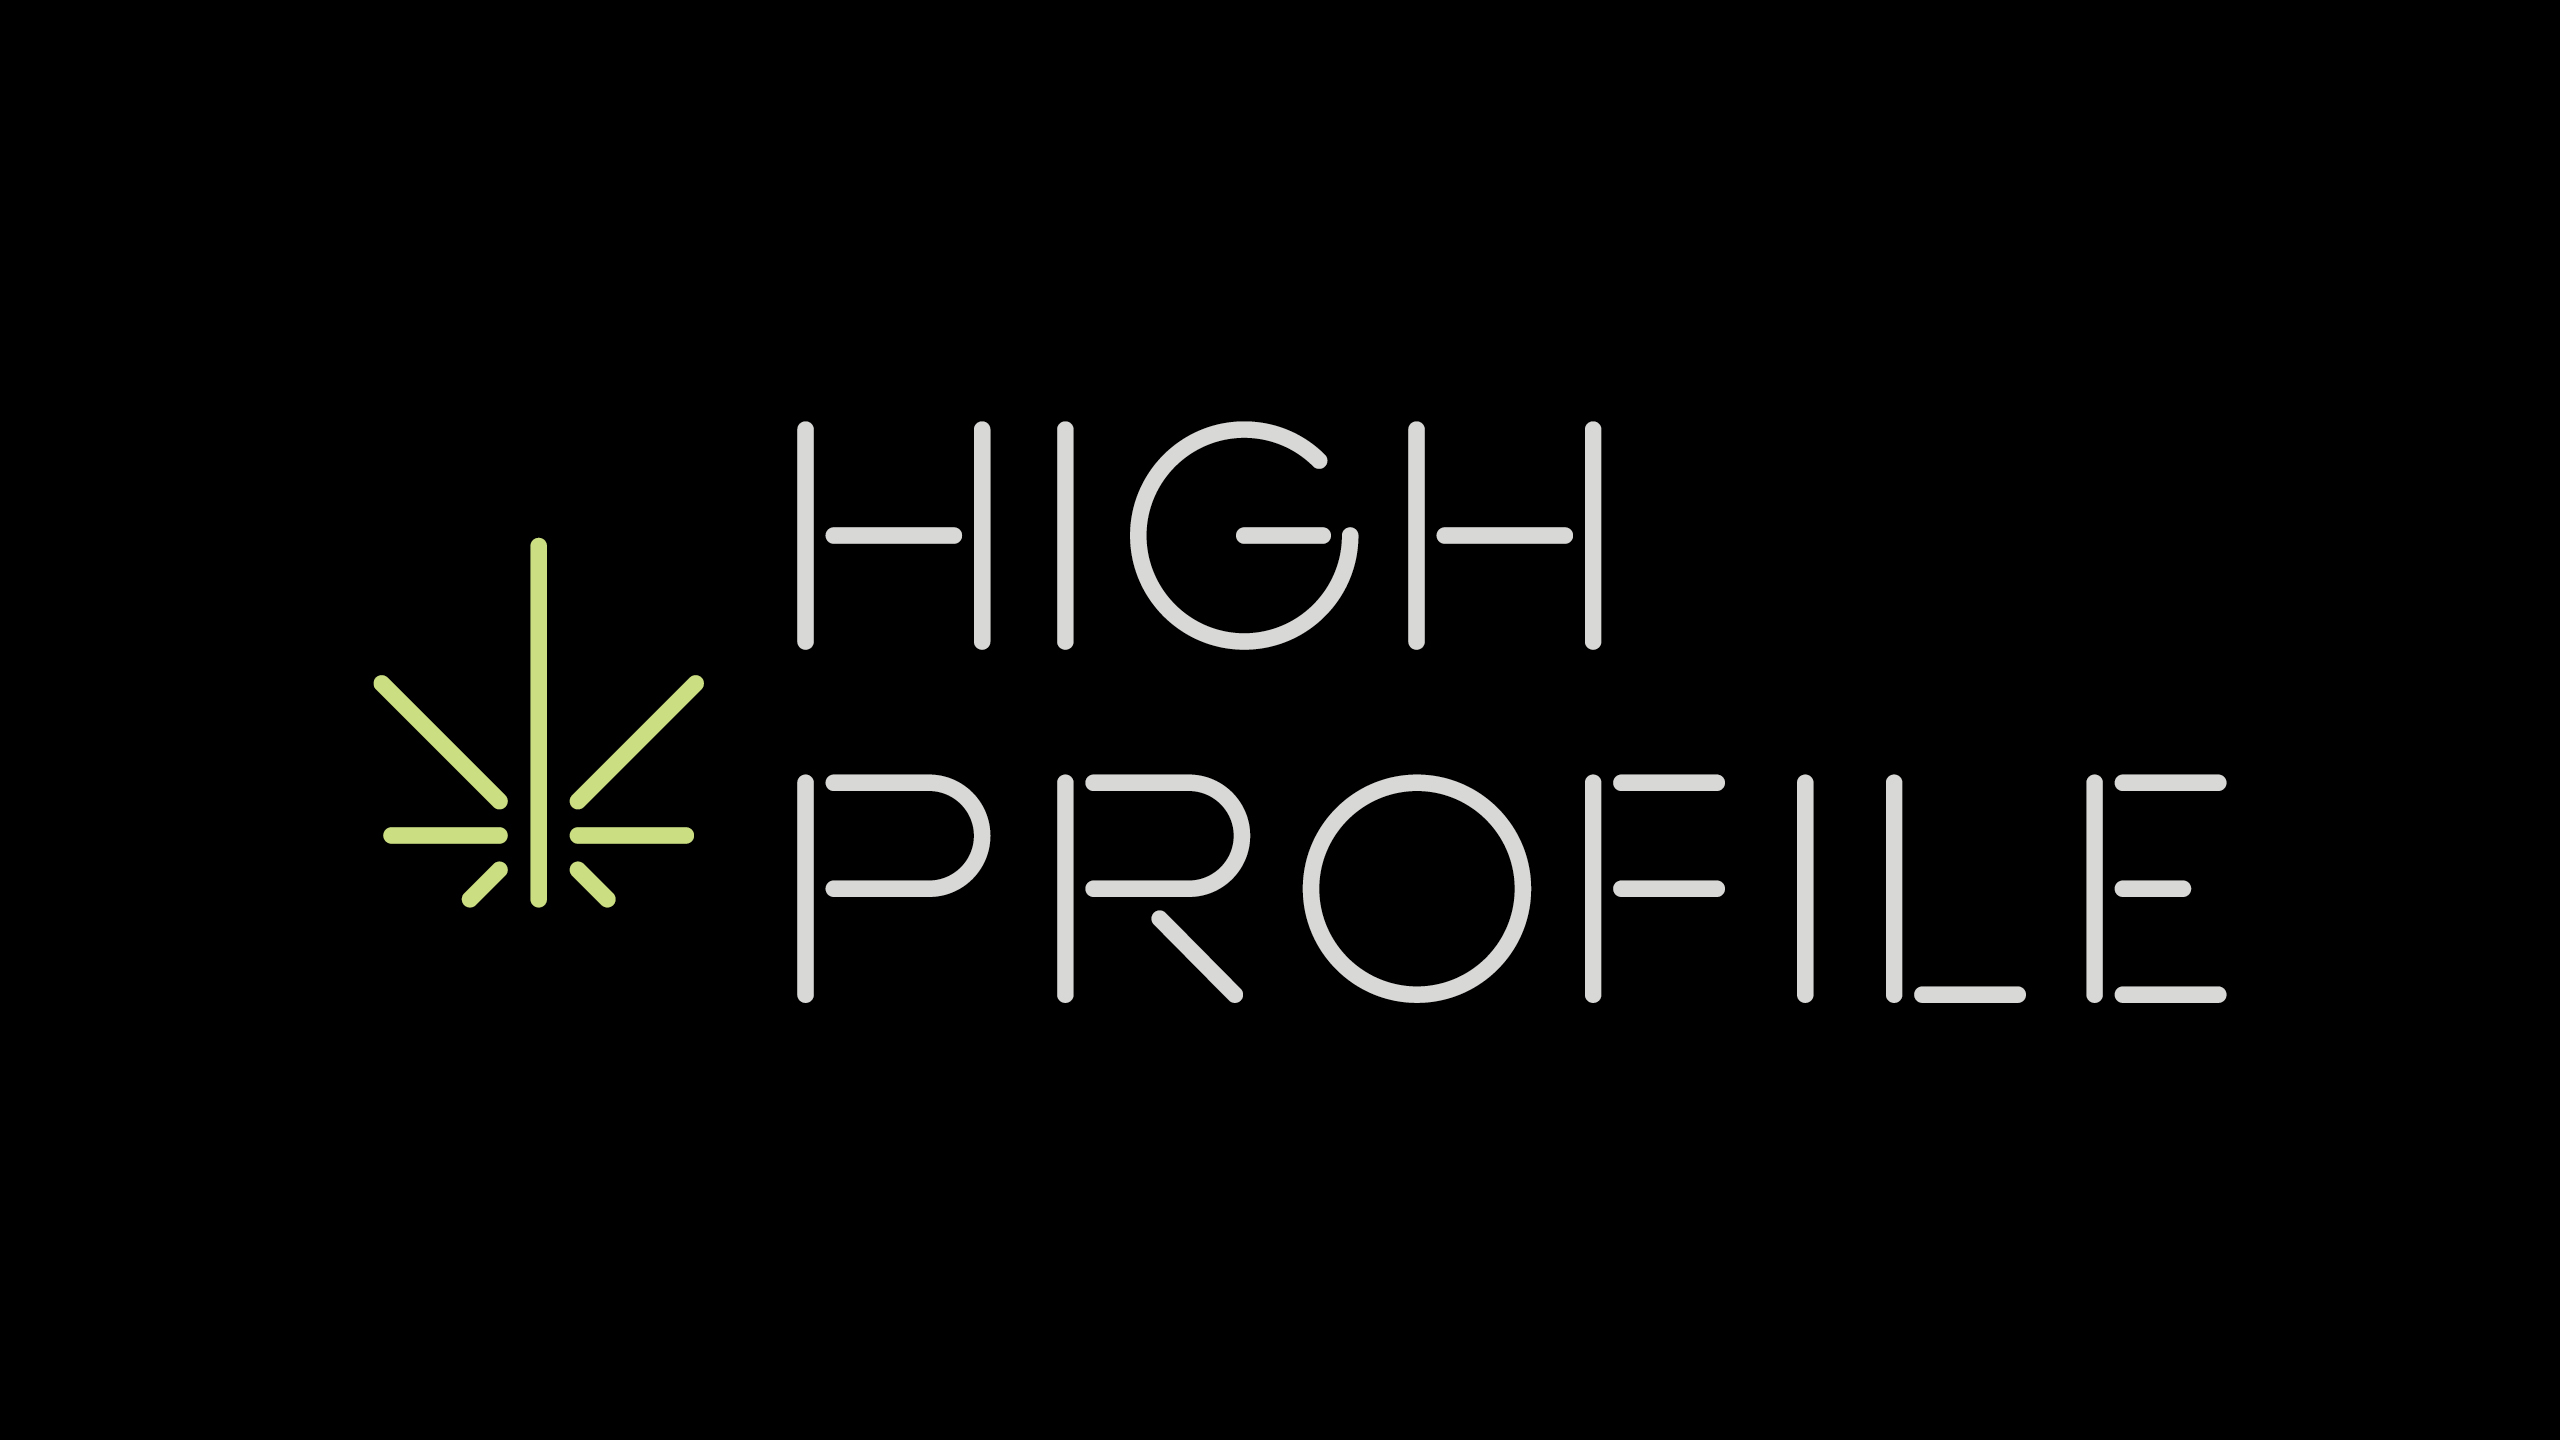 High Profile Brand Identity & Logo Creation by High Road Design Studio